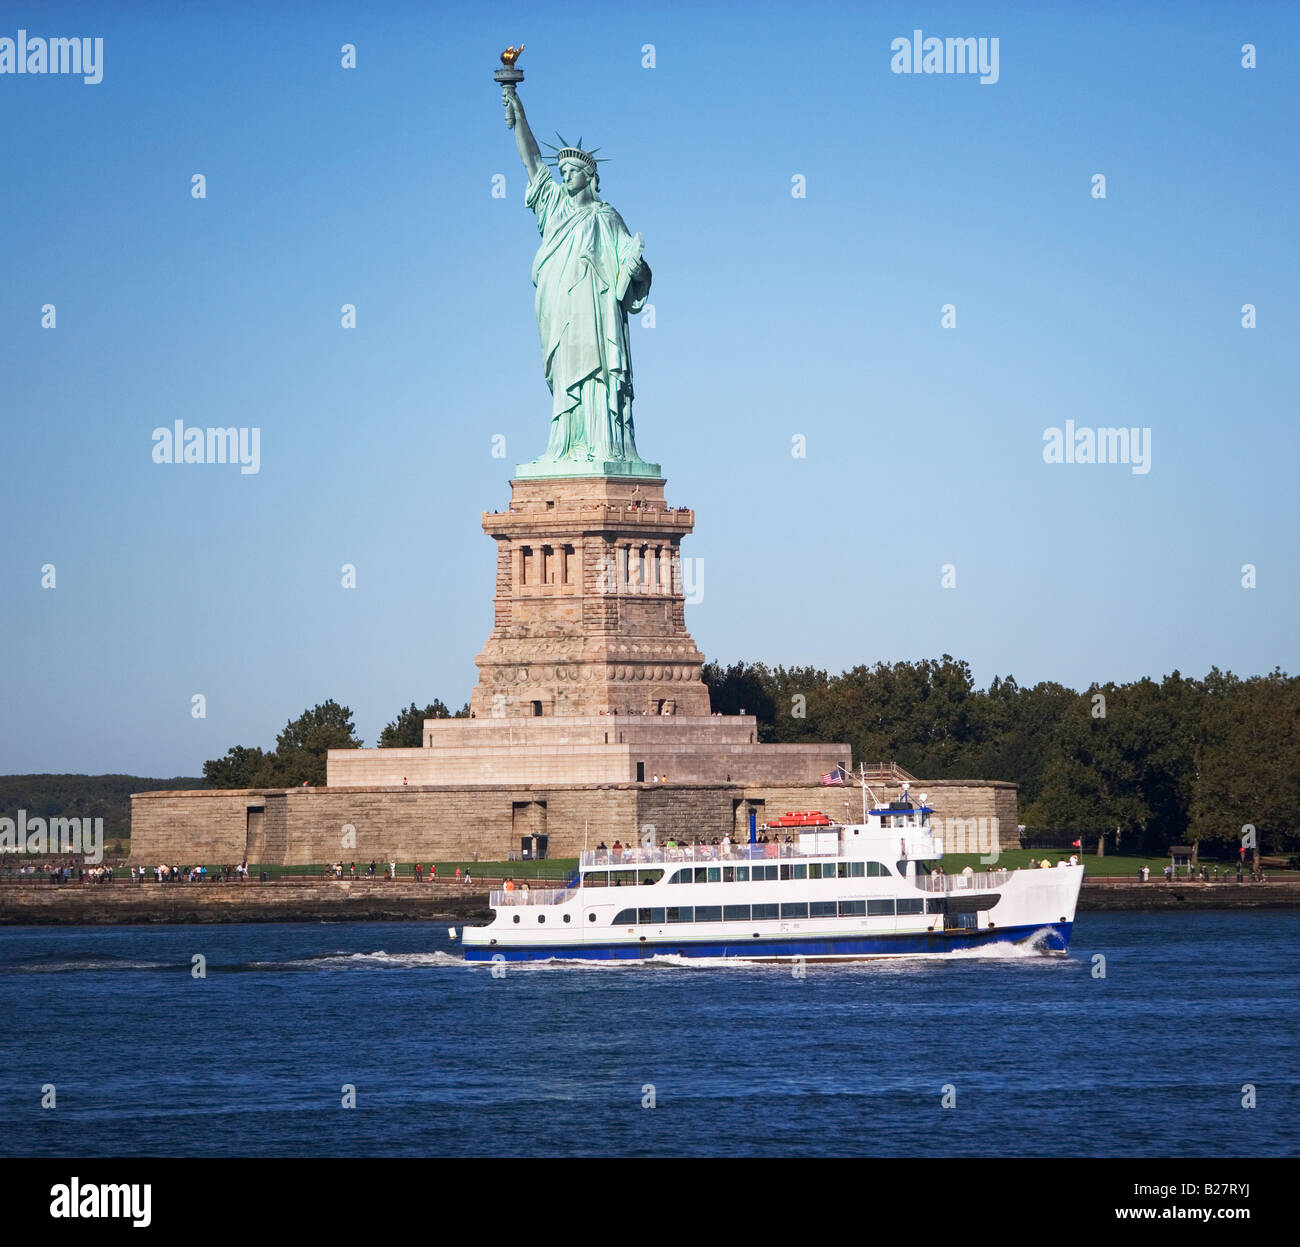 Circle Line cruising past Statue of Liberty, New York, United States - Stock Image